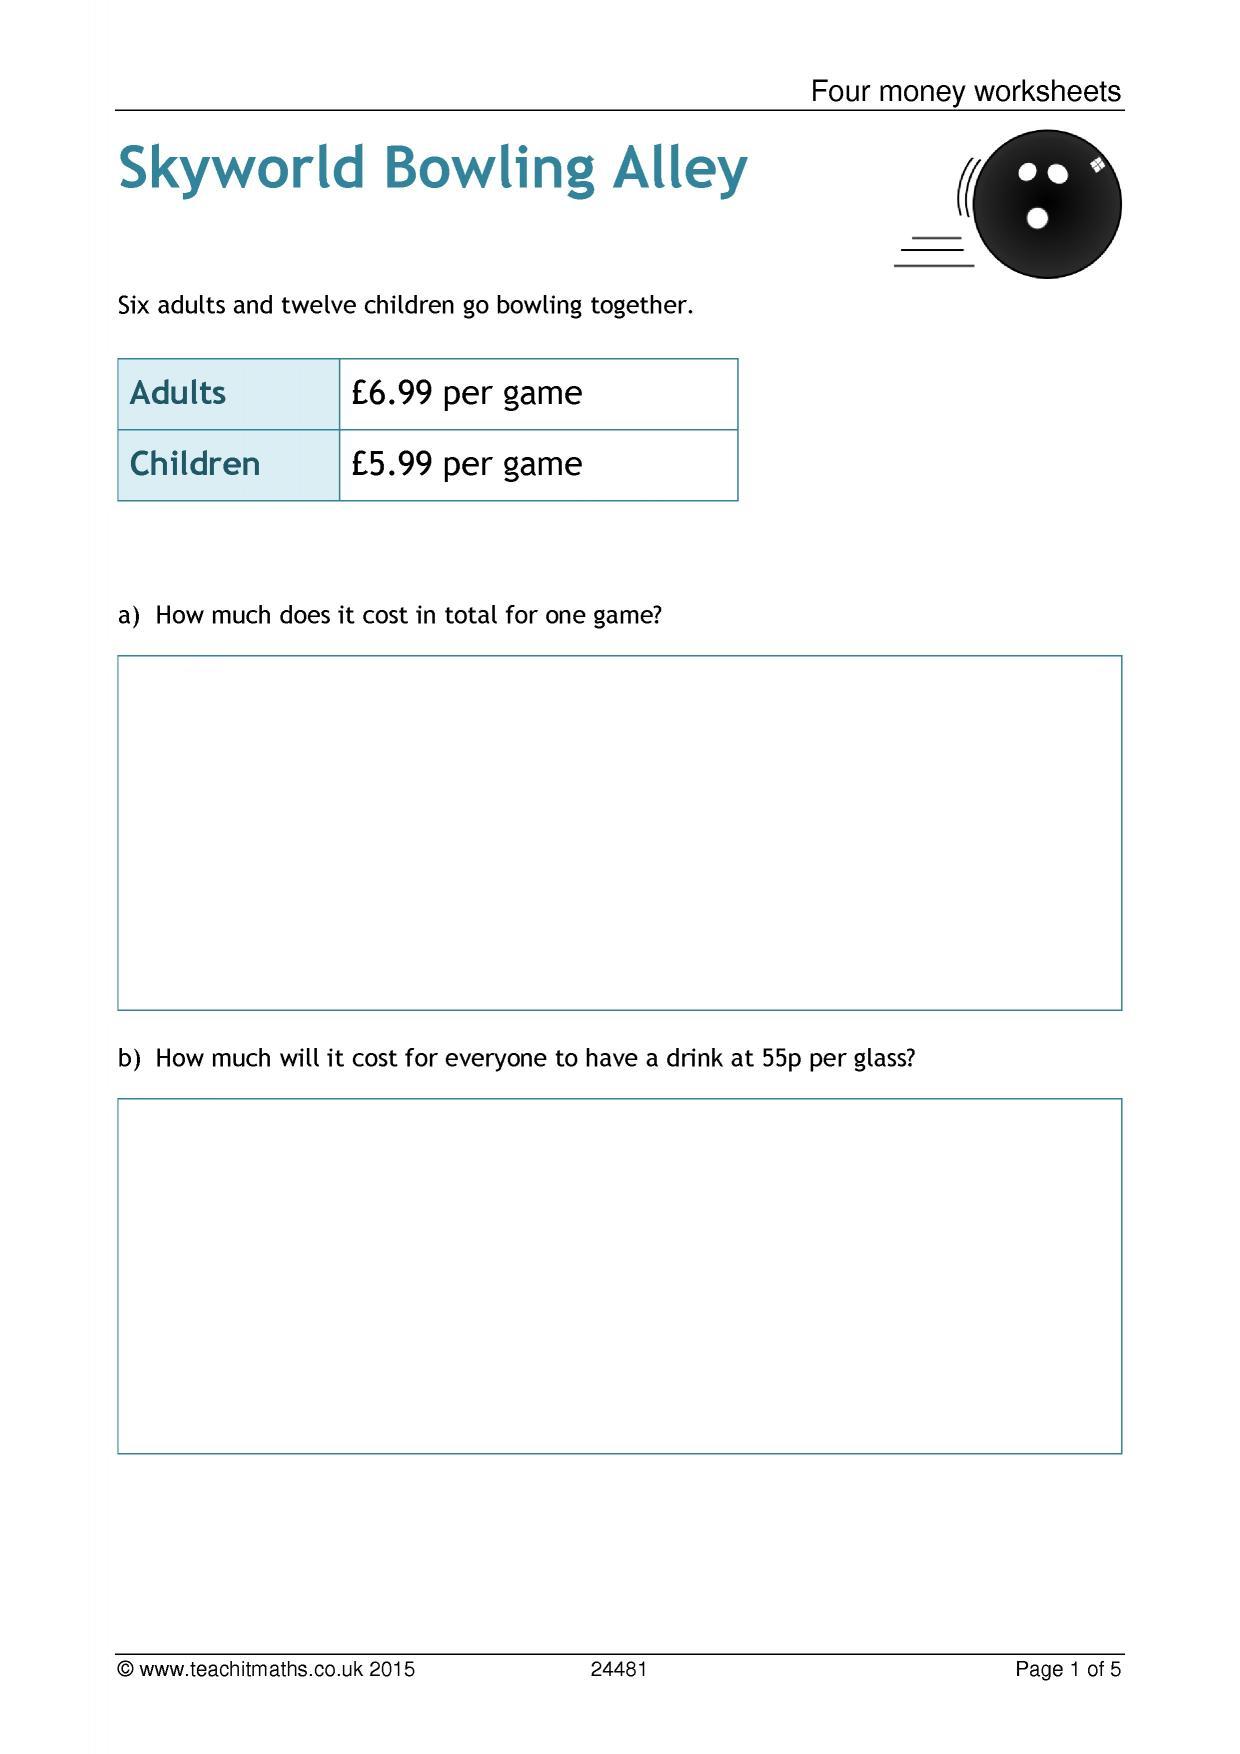 Four Money Worksheets